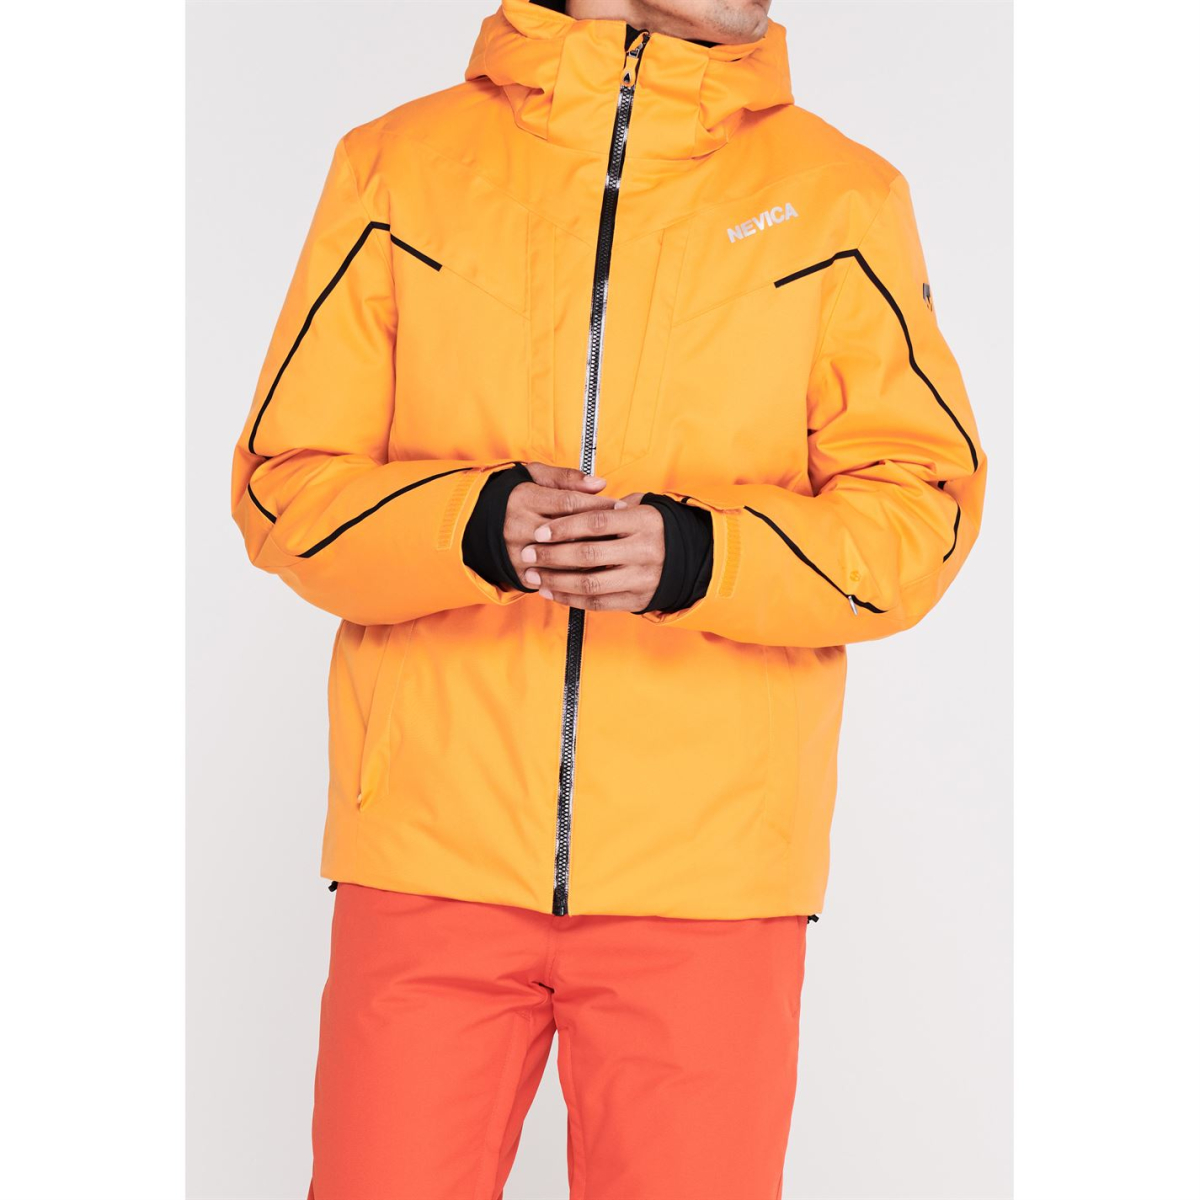 Nevica Vail Ski Winterjacke Jacke Herren